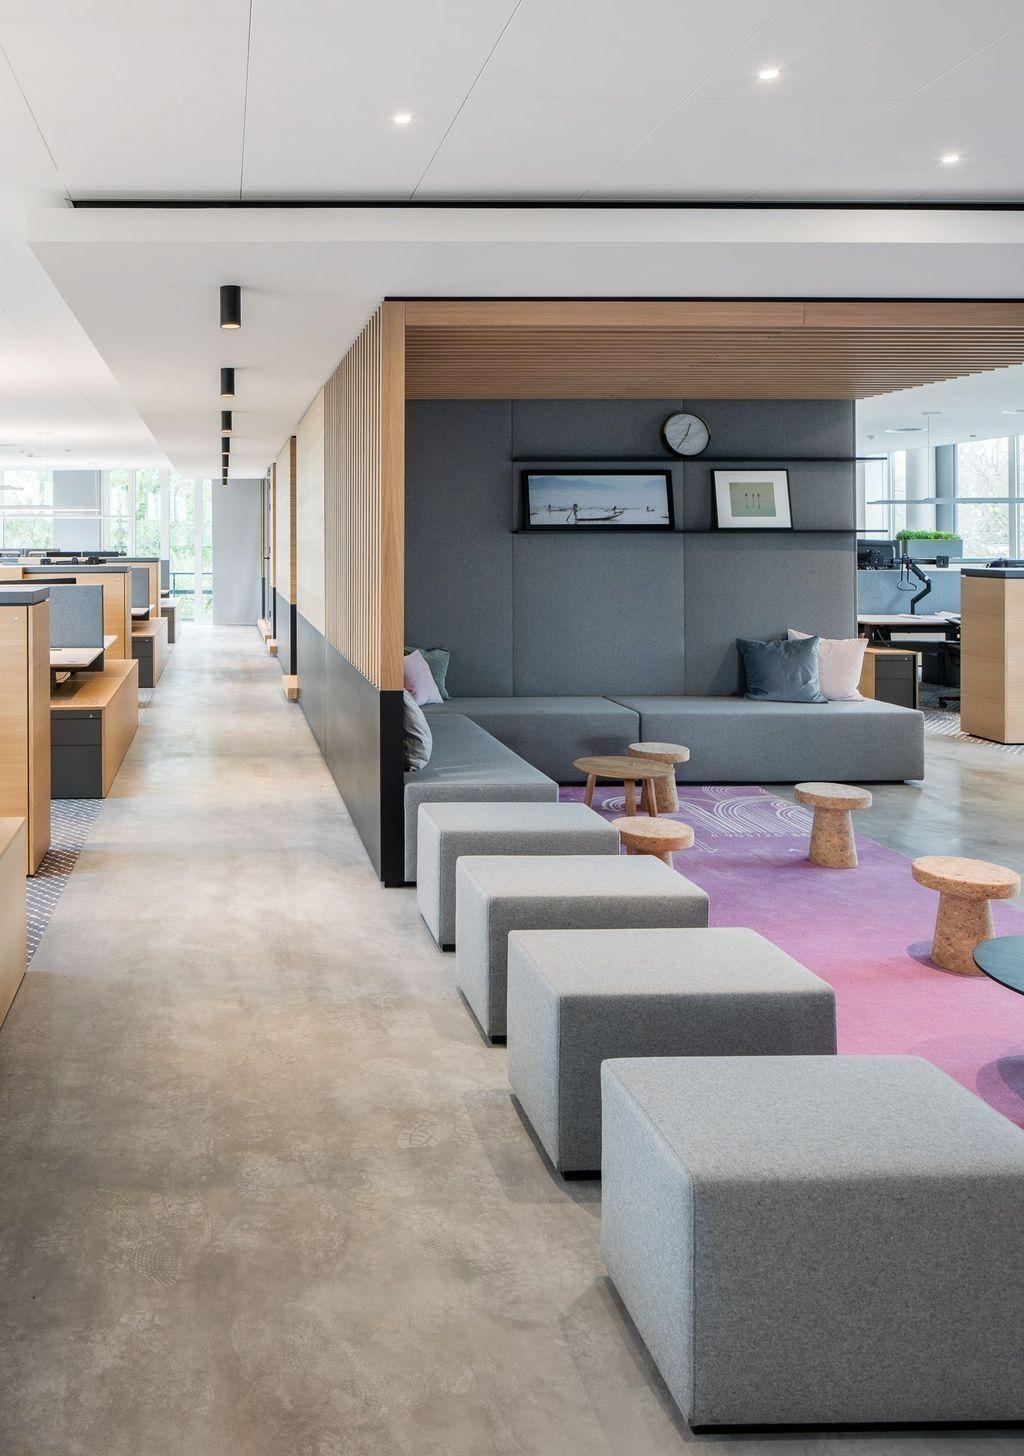 captivating cozy modern living room ideas   Nice 34 Captivating Space Design Ideas For Cozy Room To ...